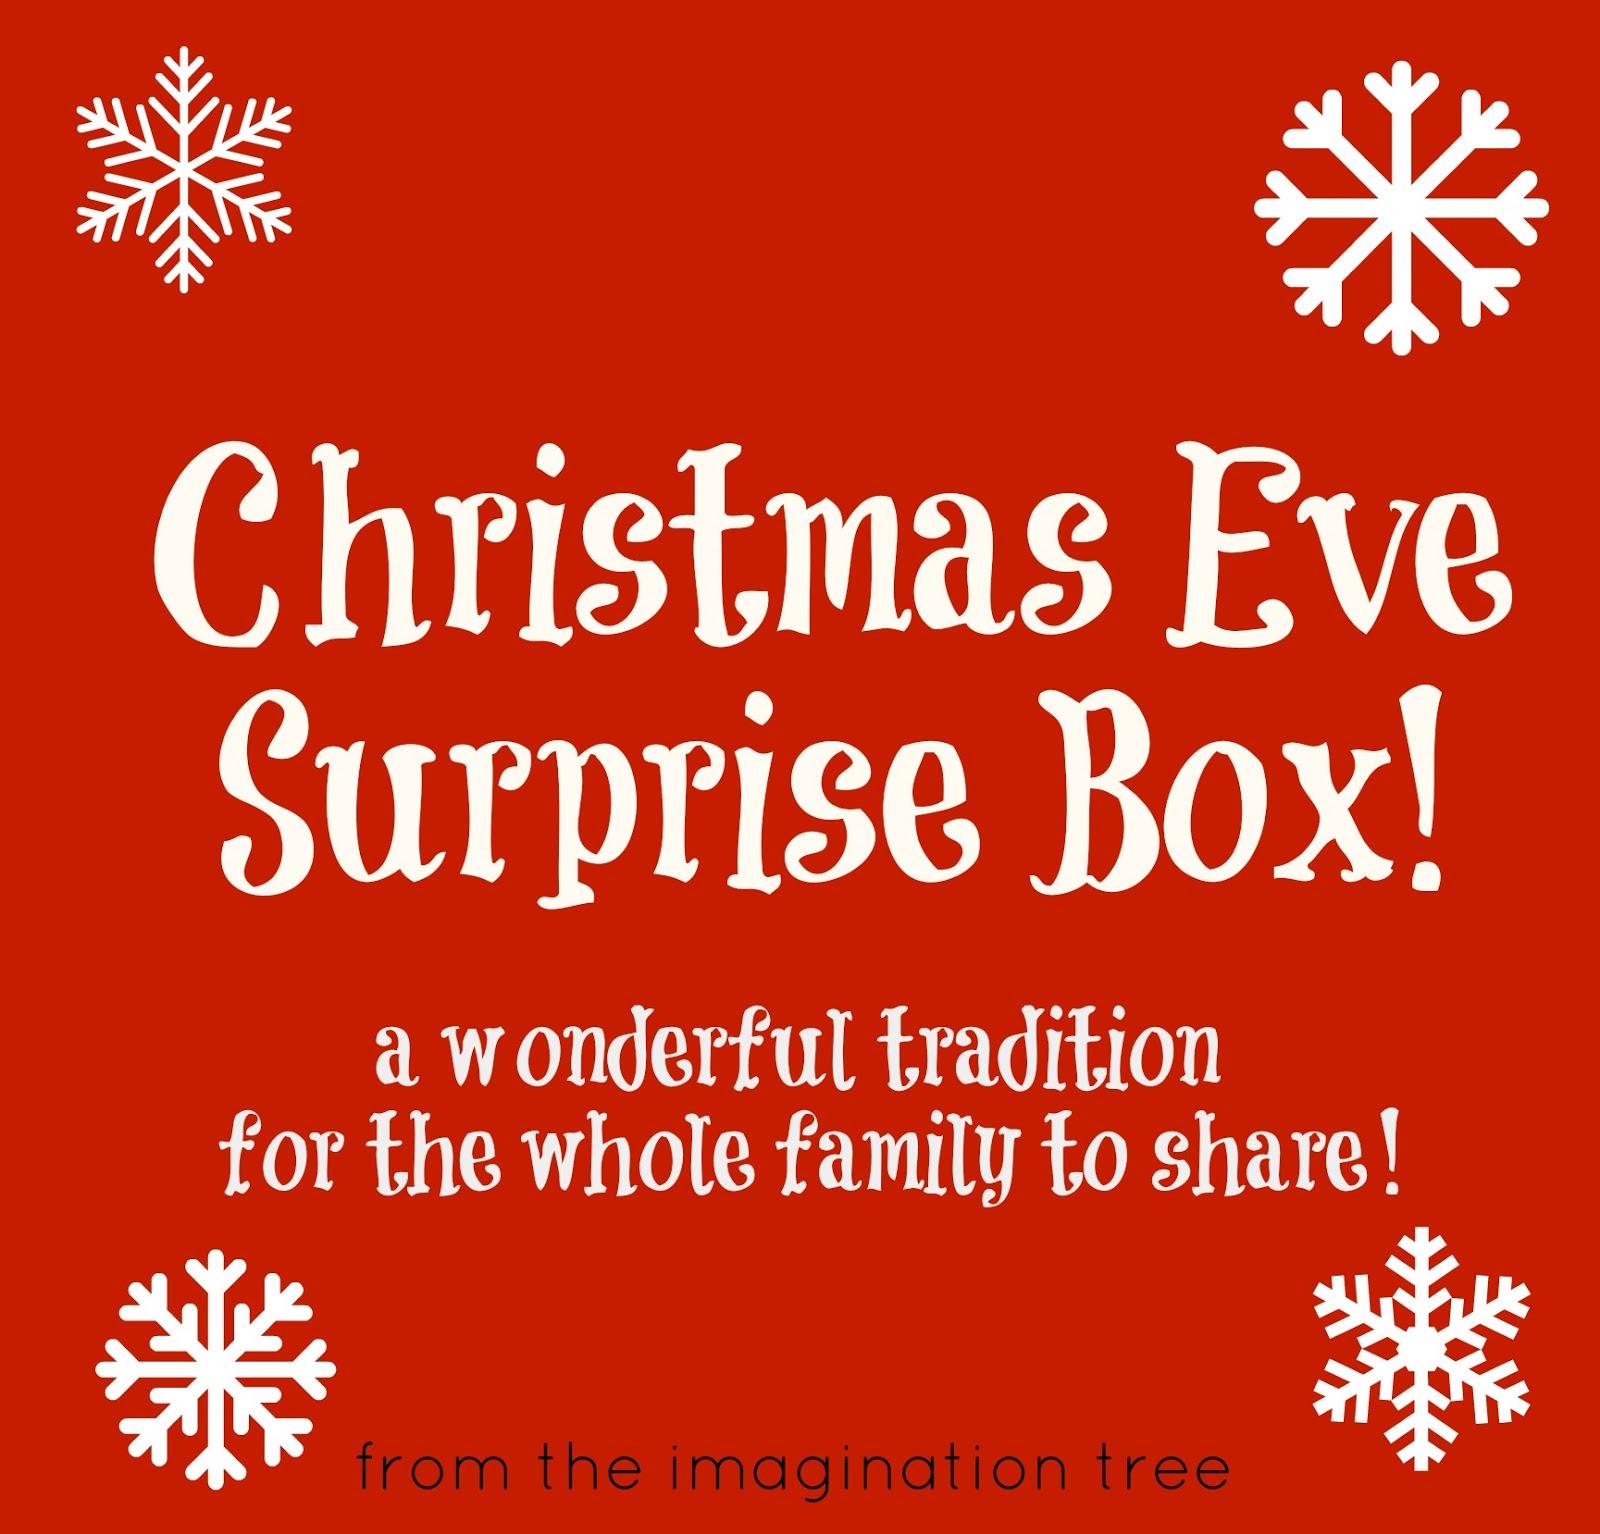 Christmas Eve Surprise Box The Imagination Tree